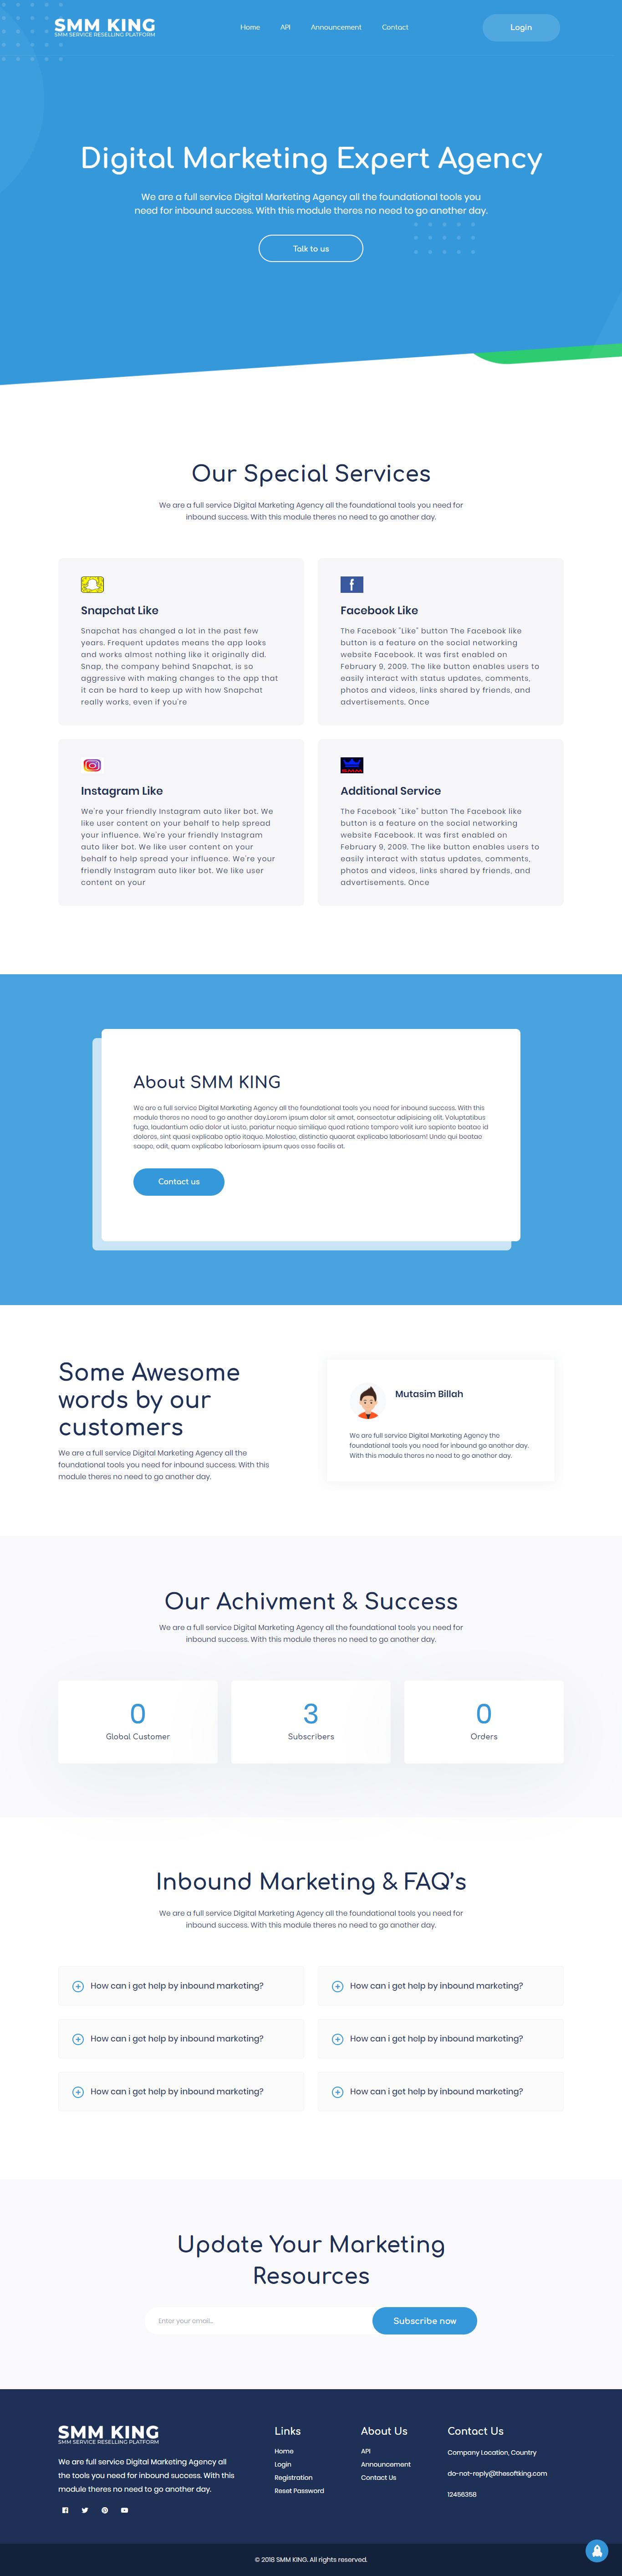 SMMKING - Social Media Marketing Panel